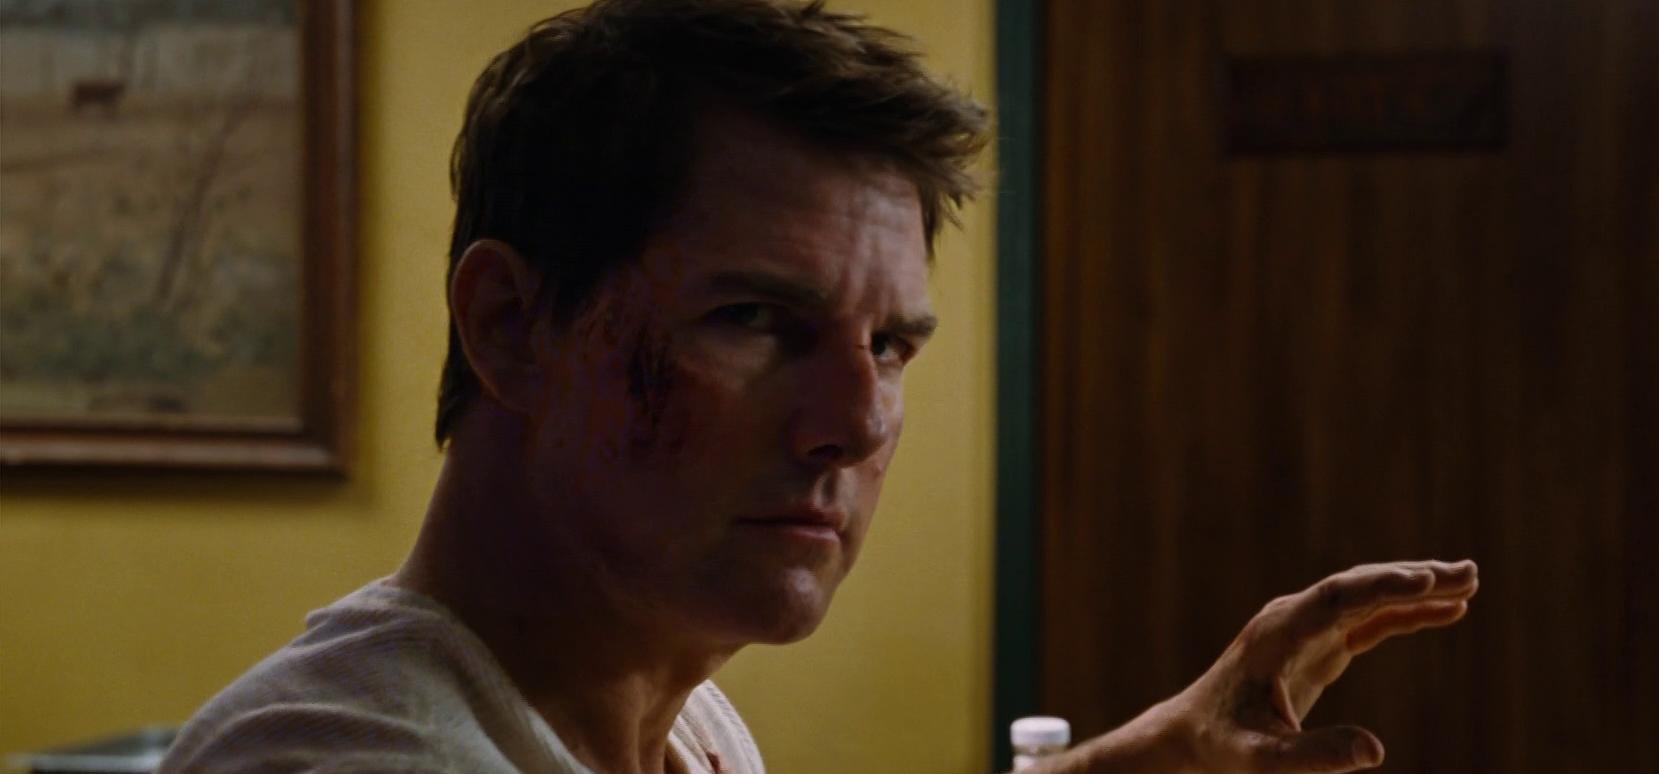 Jack Reacher : Never go back (2016) d'Edward Zwick : l'évasion (HD)